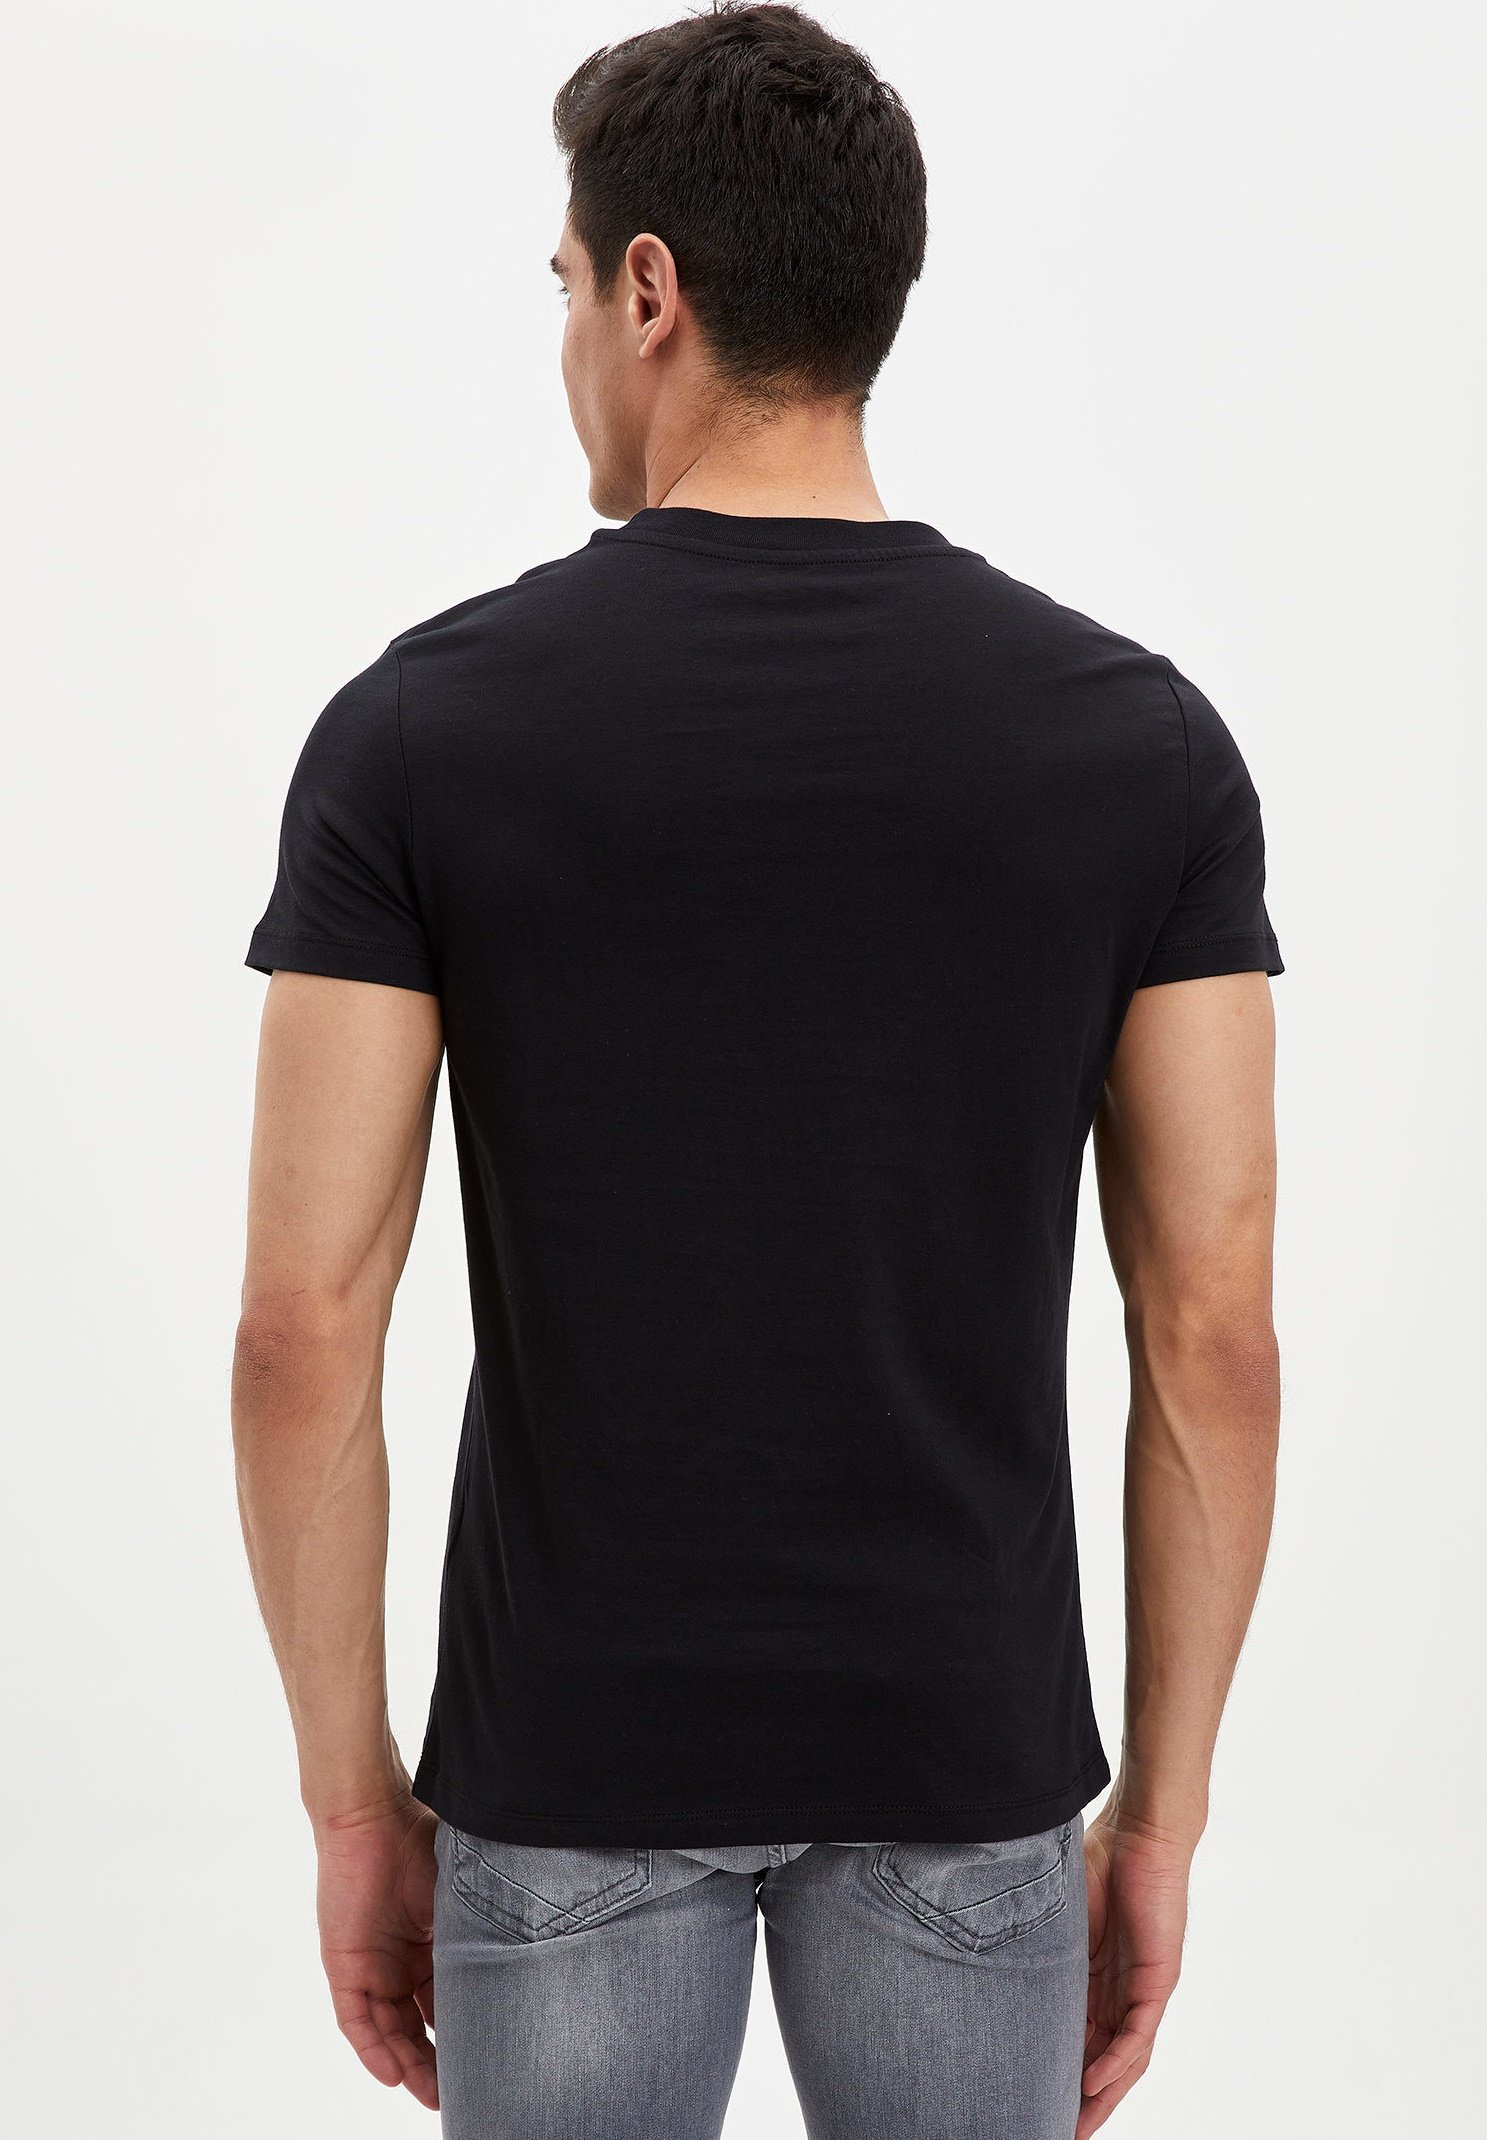 DeFacto Print T-shirt - black BxF3i